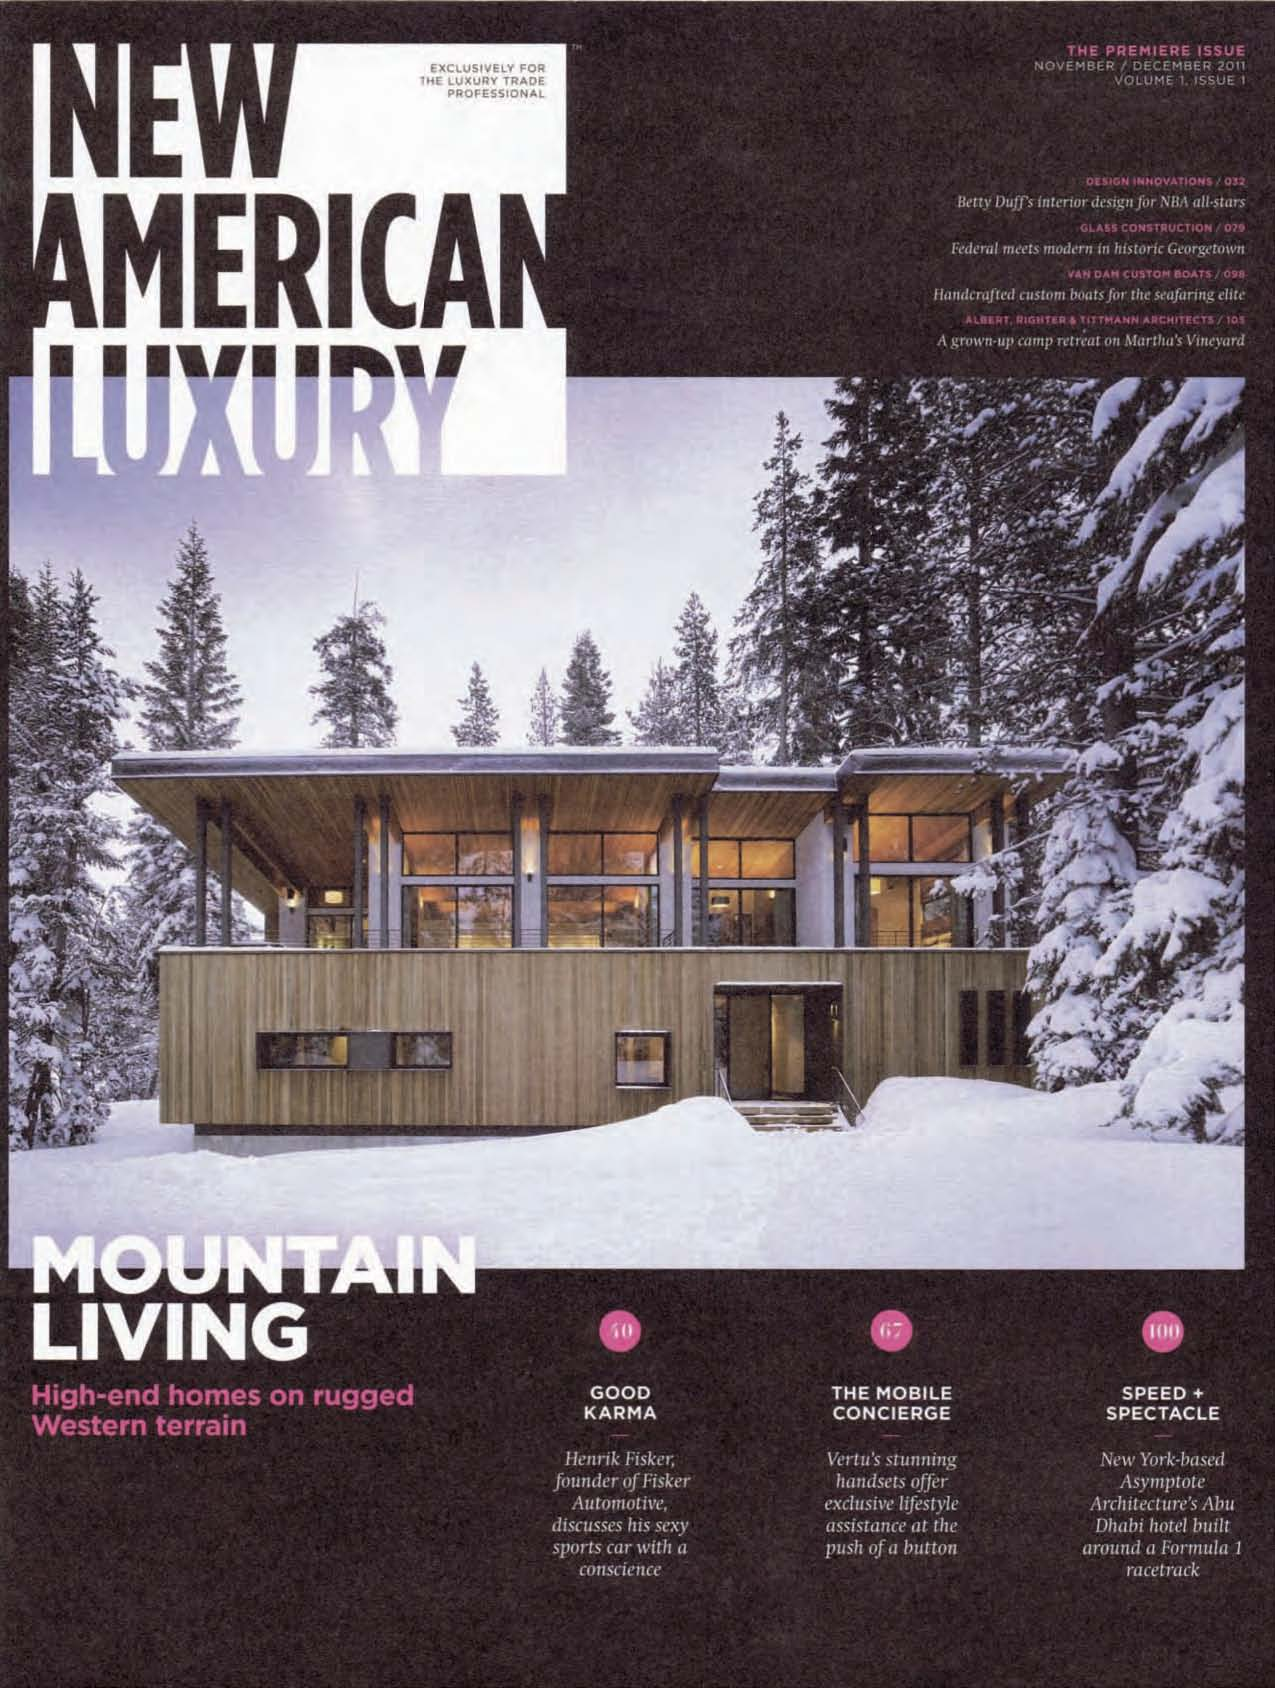 New Amercan Luxury.jpg